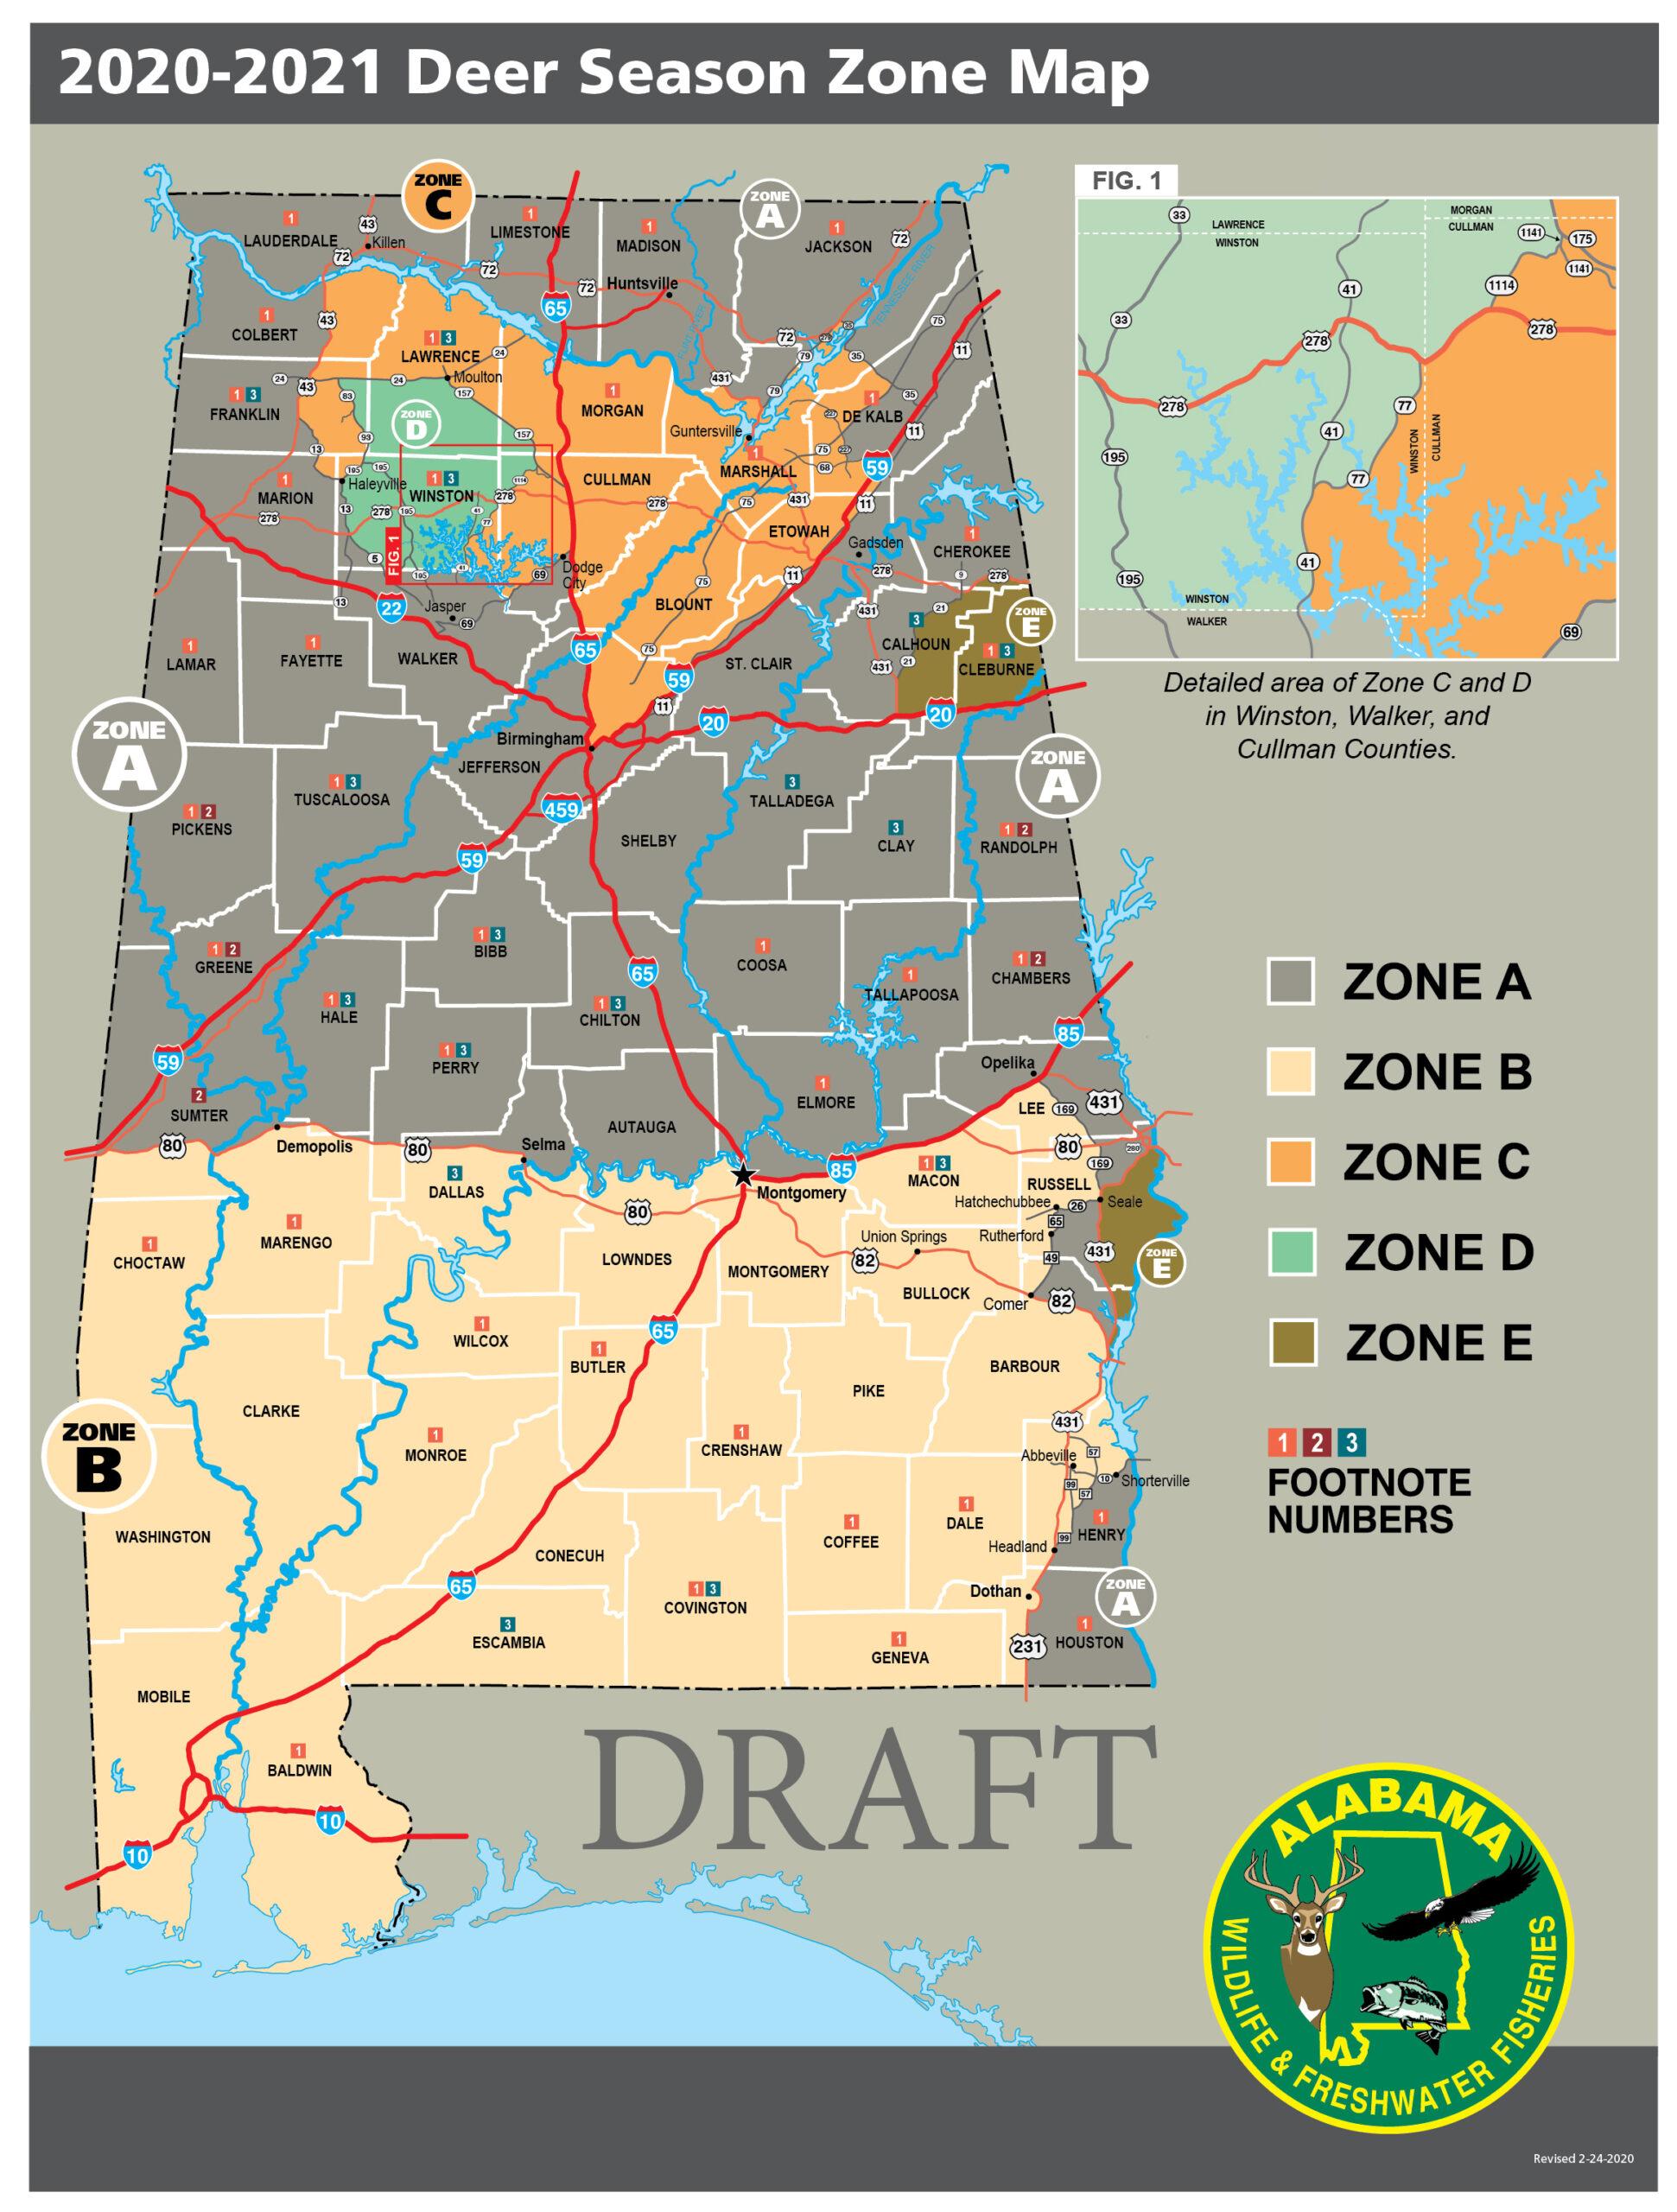 Conservation Advisory Board Considers Deer Zones, Turkey pertaining to Georgia Rut Map 2021